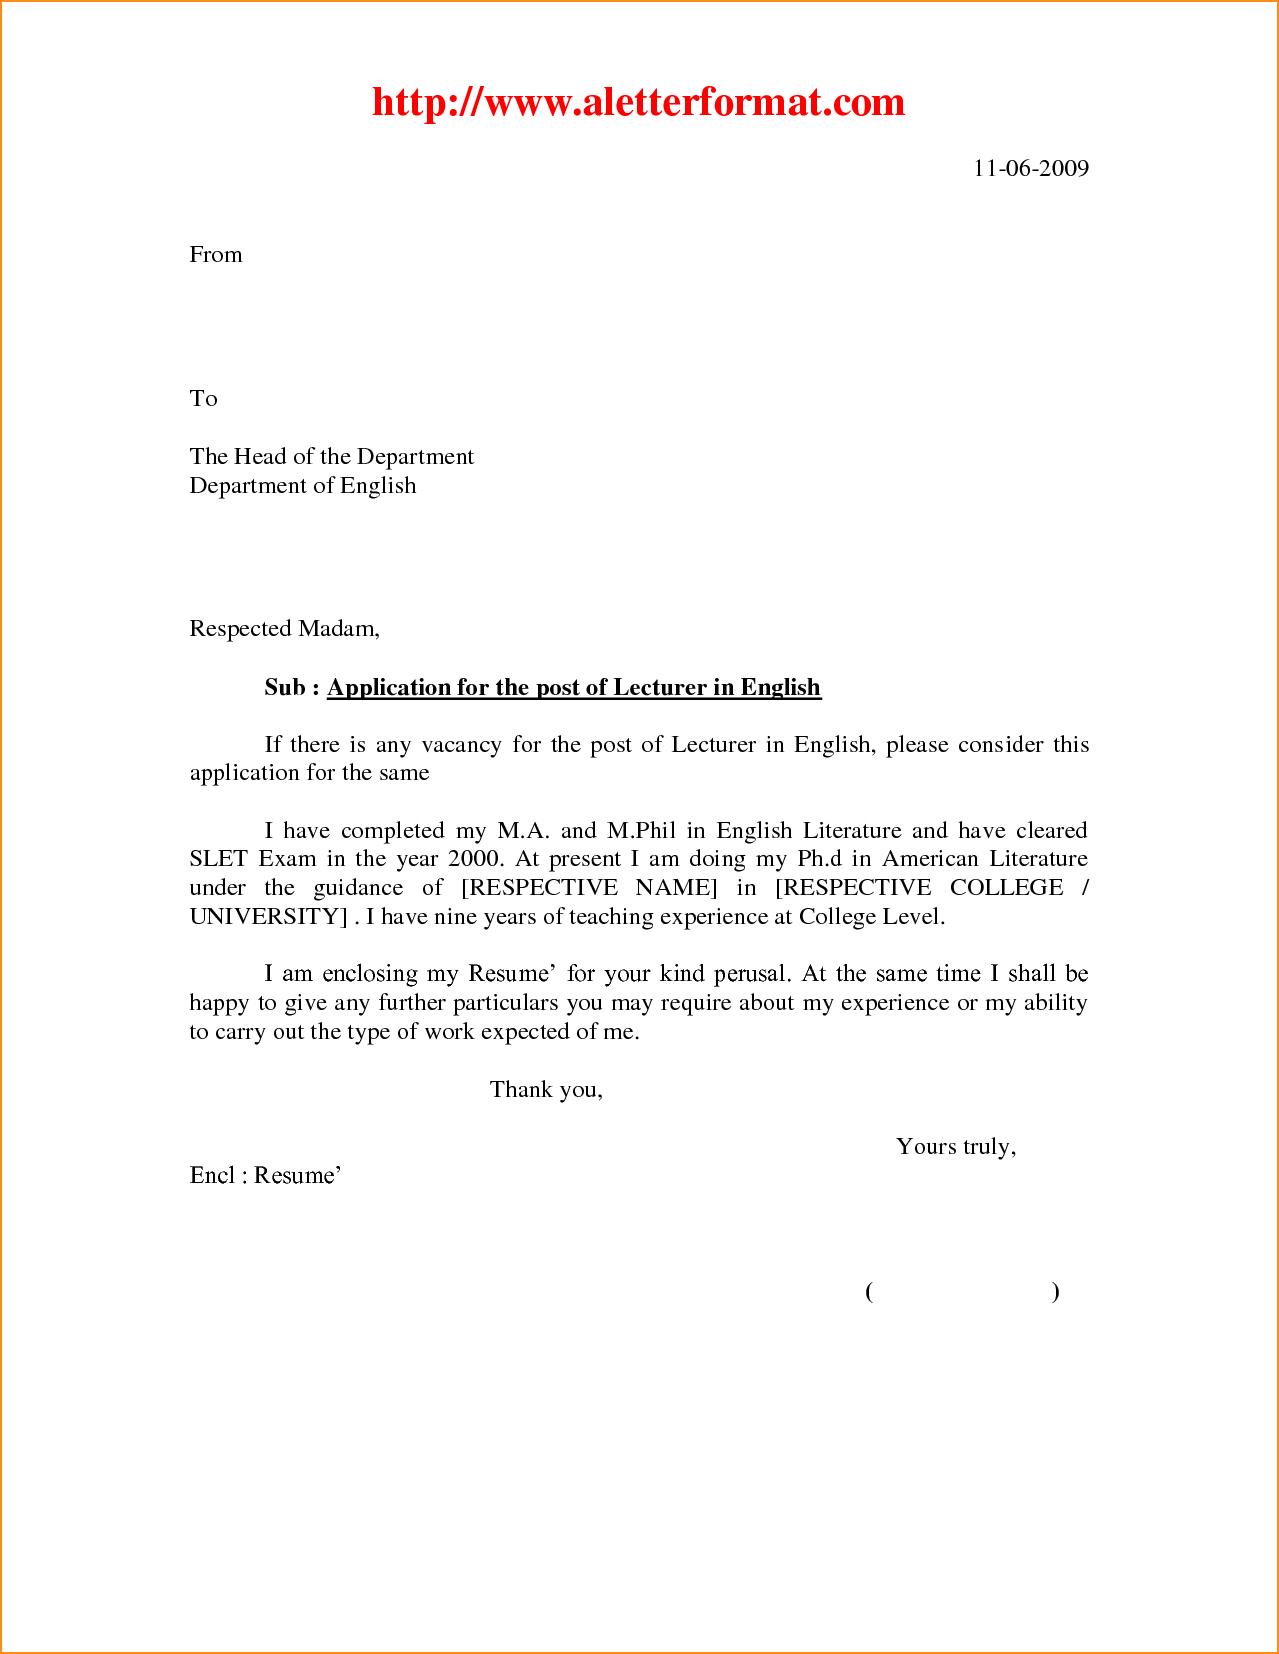 Job Application Cover Letter Format Basic Appication Jan